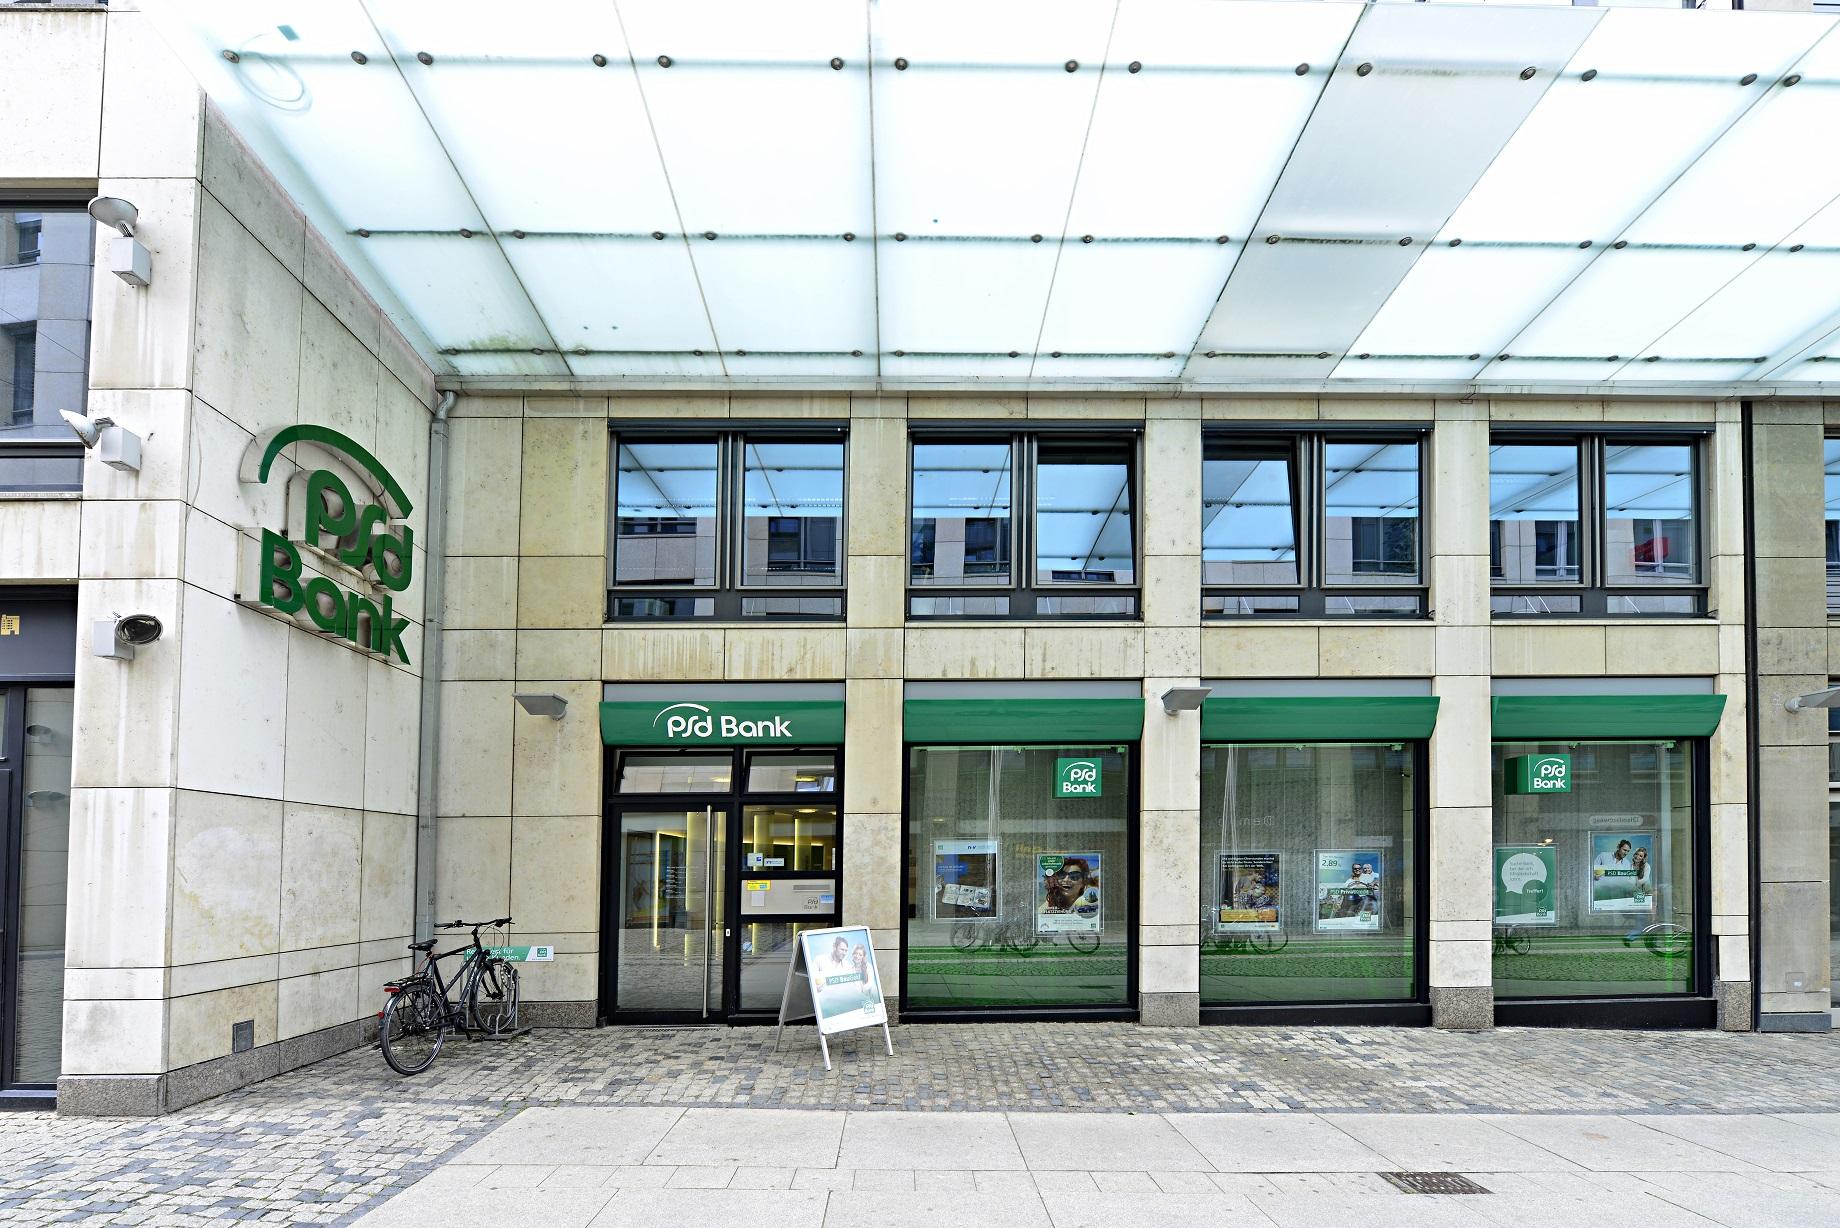 Fotos de PSD Bank Nürnberg eG, Filiale Leipzig